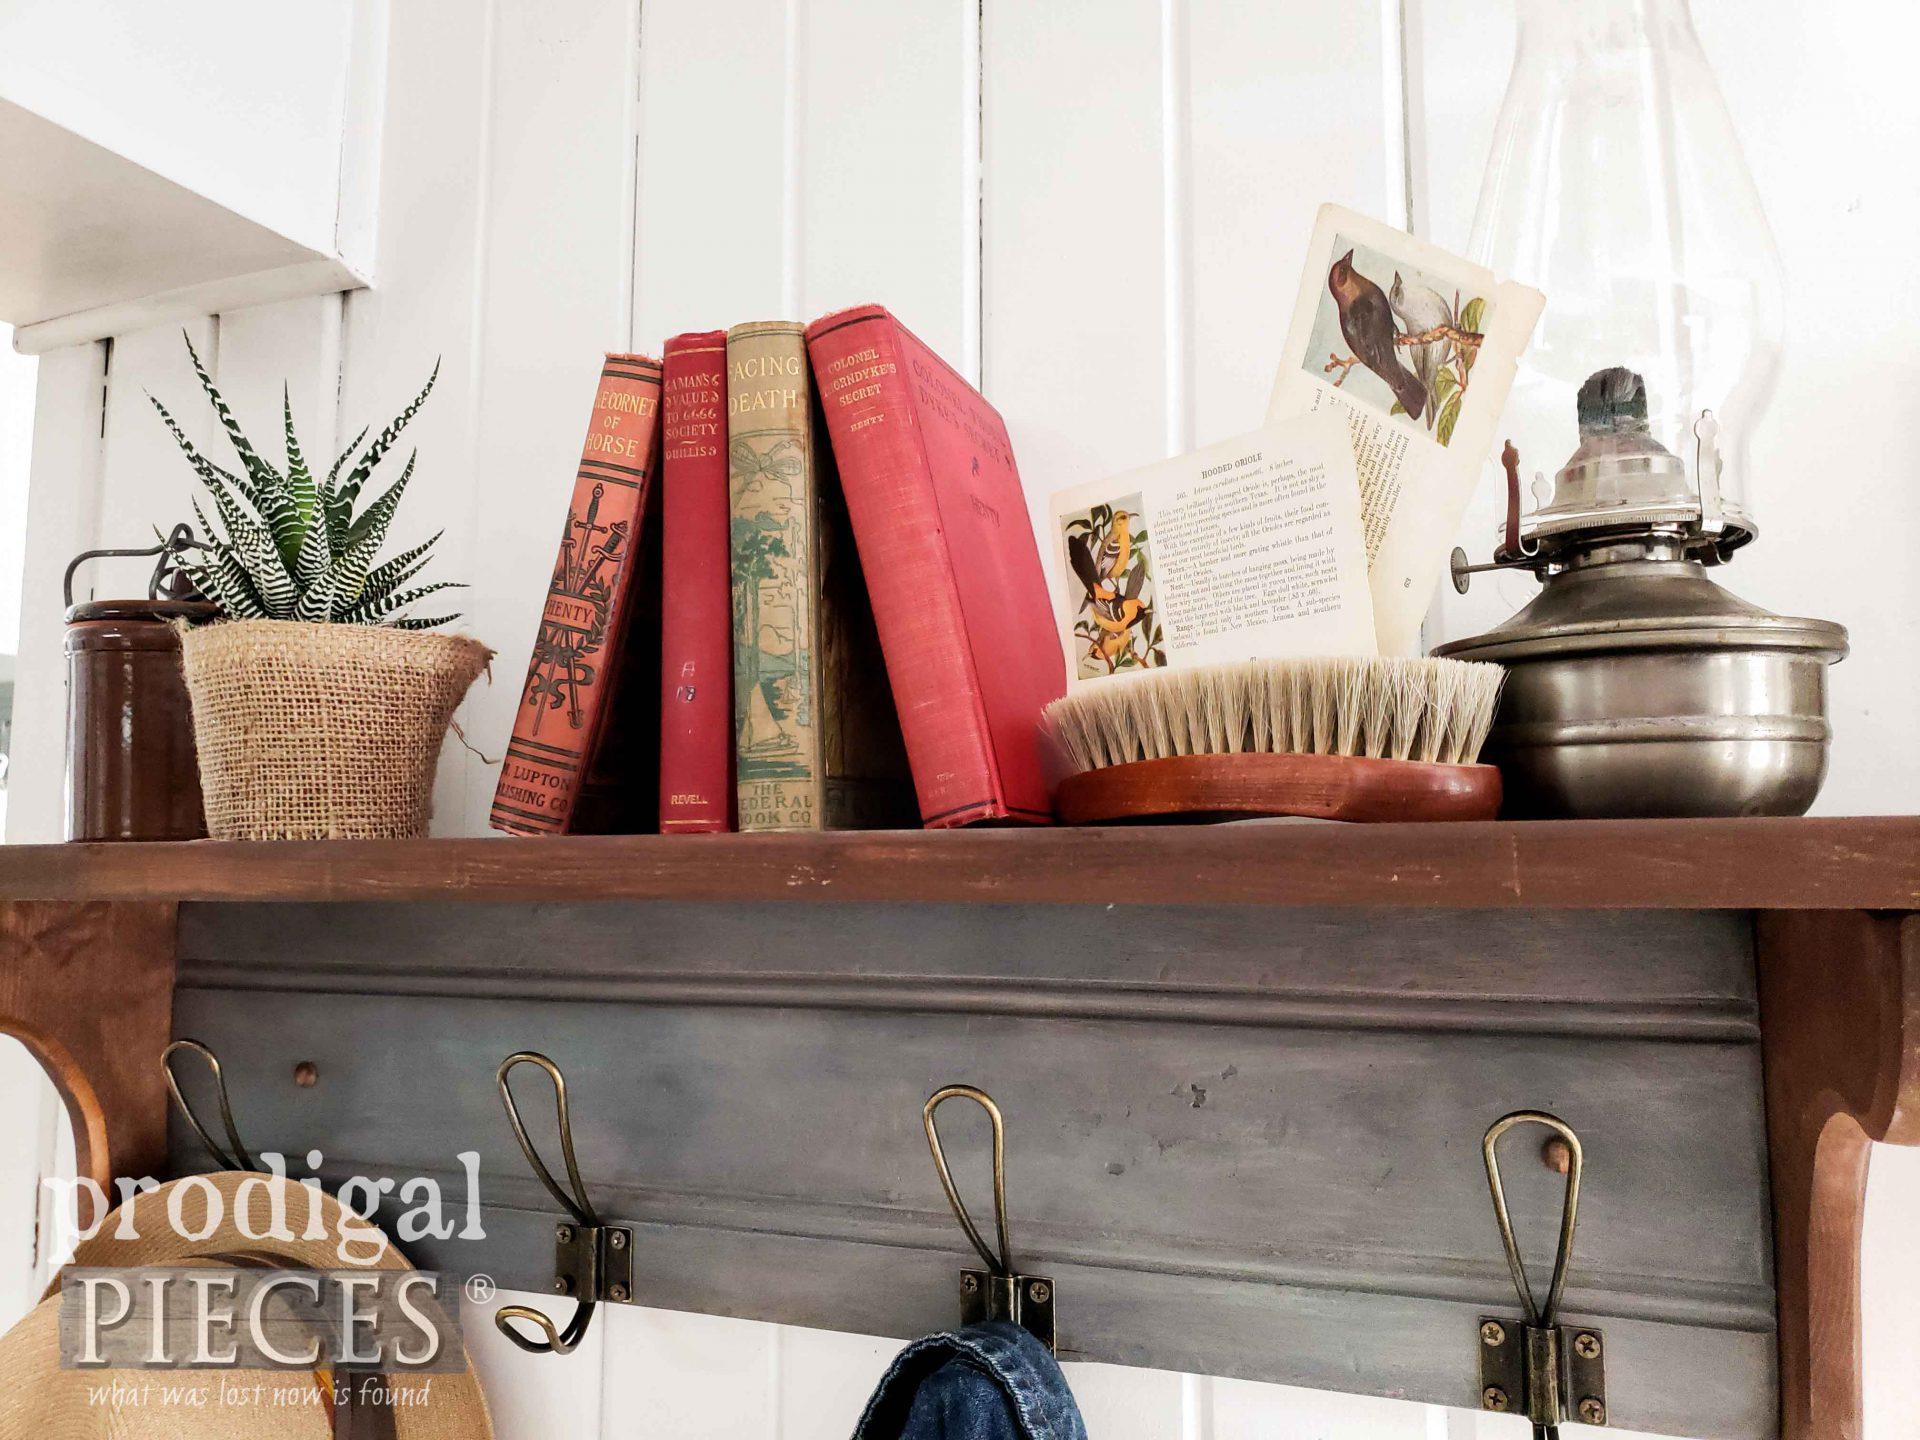 DIY Farmhouse Decor by Larissa of Prodigal Pieces   prodigalpieces.com #prodigalpieces #fleamarket #farmhouse #diy #home #homedecor